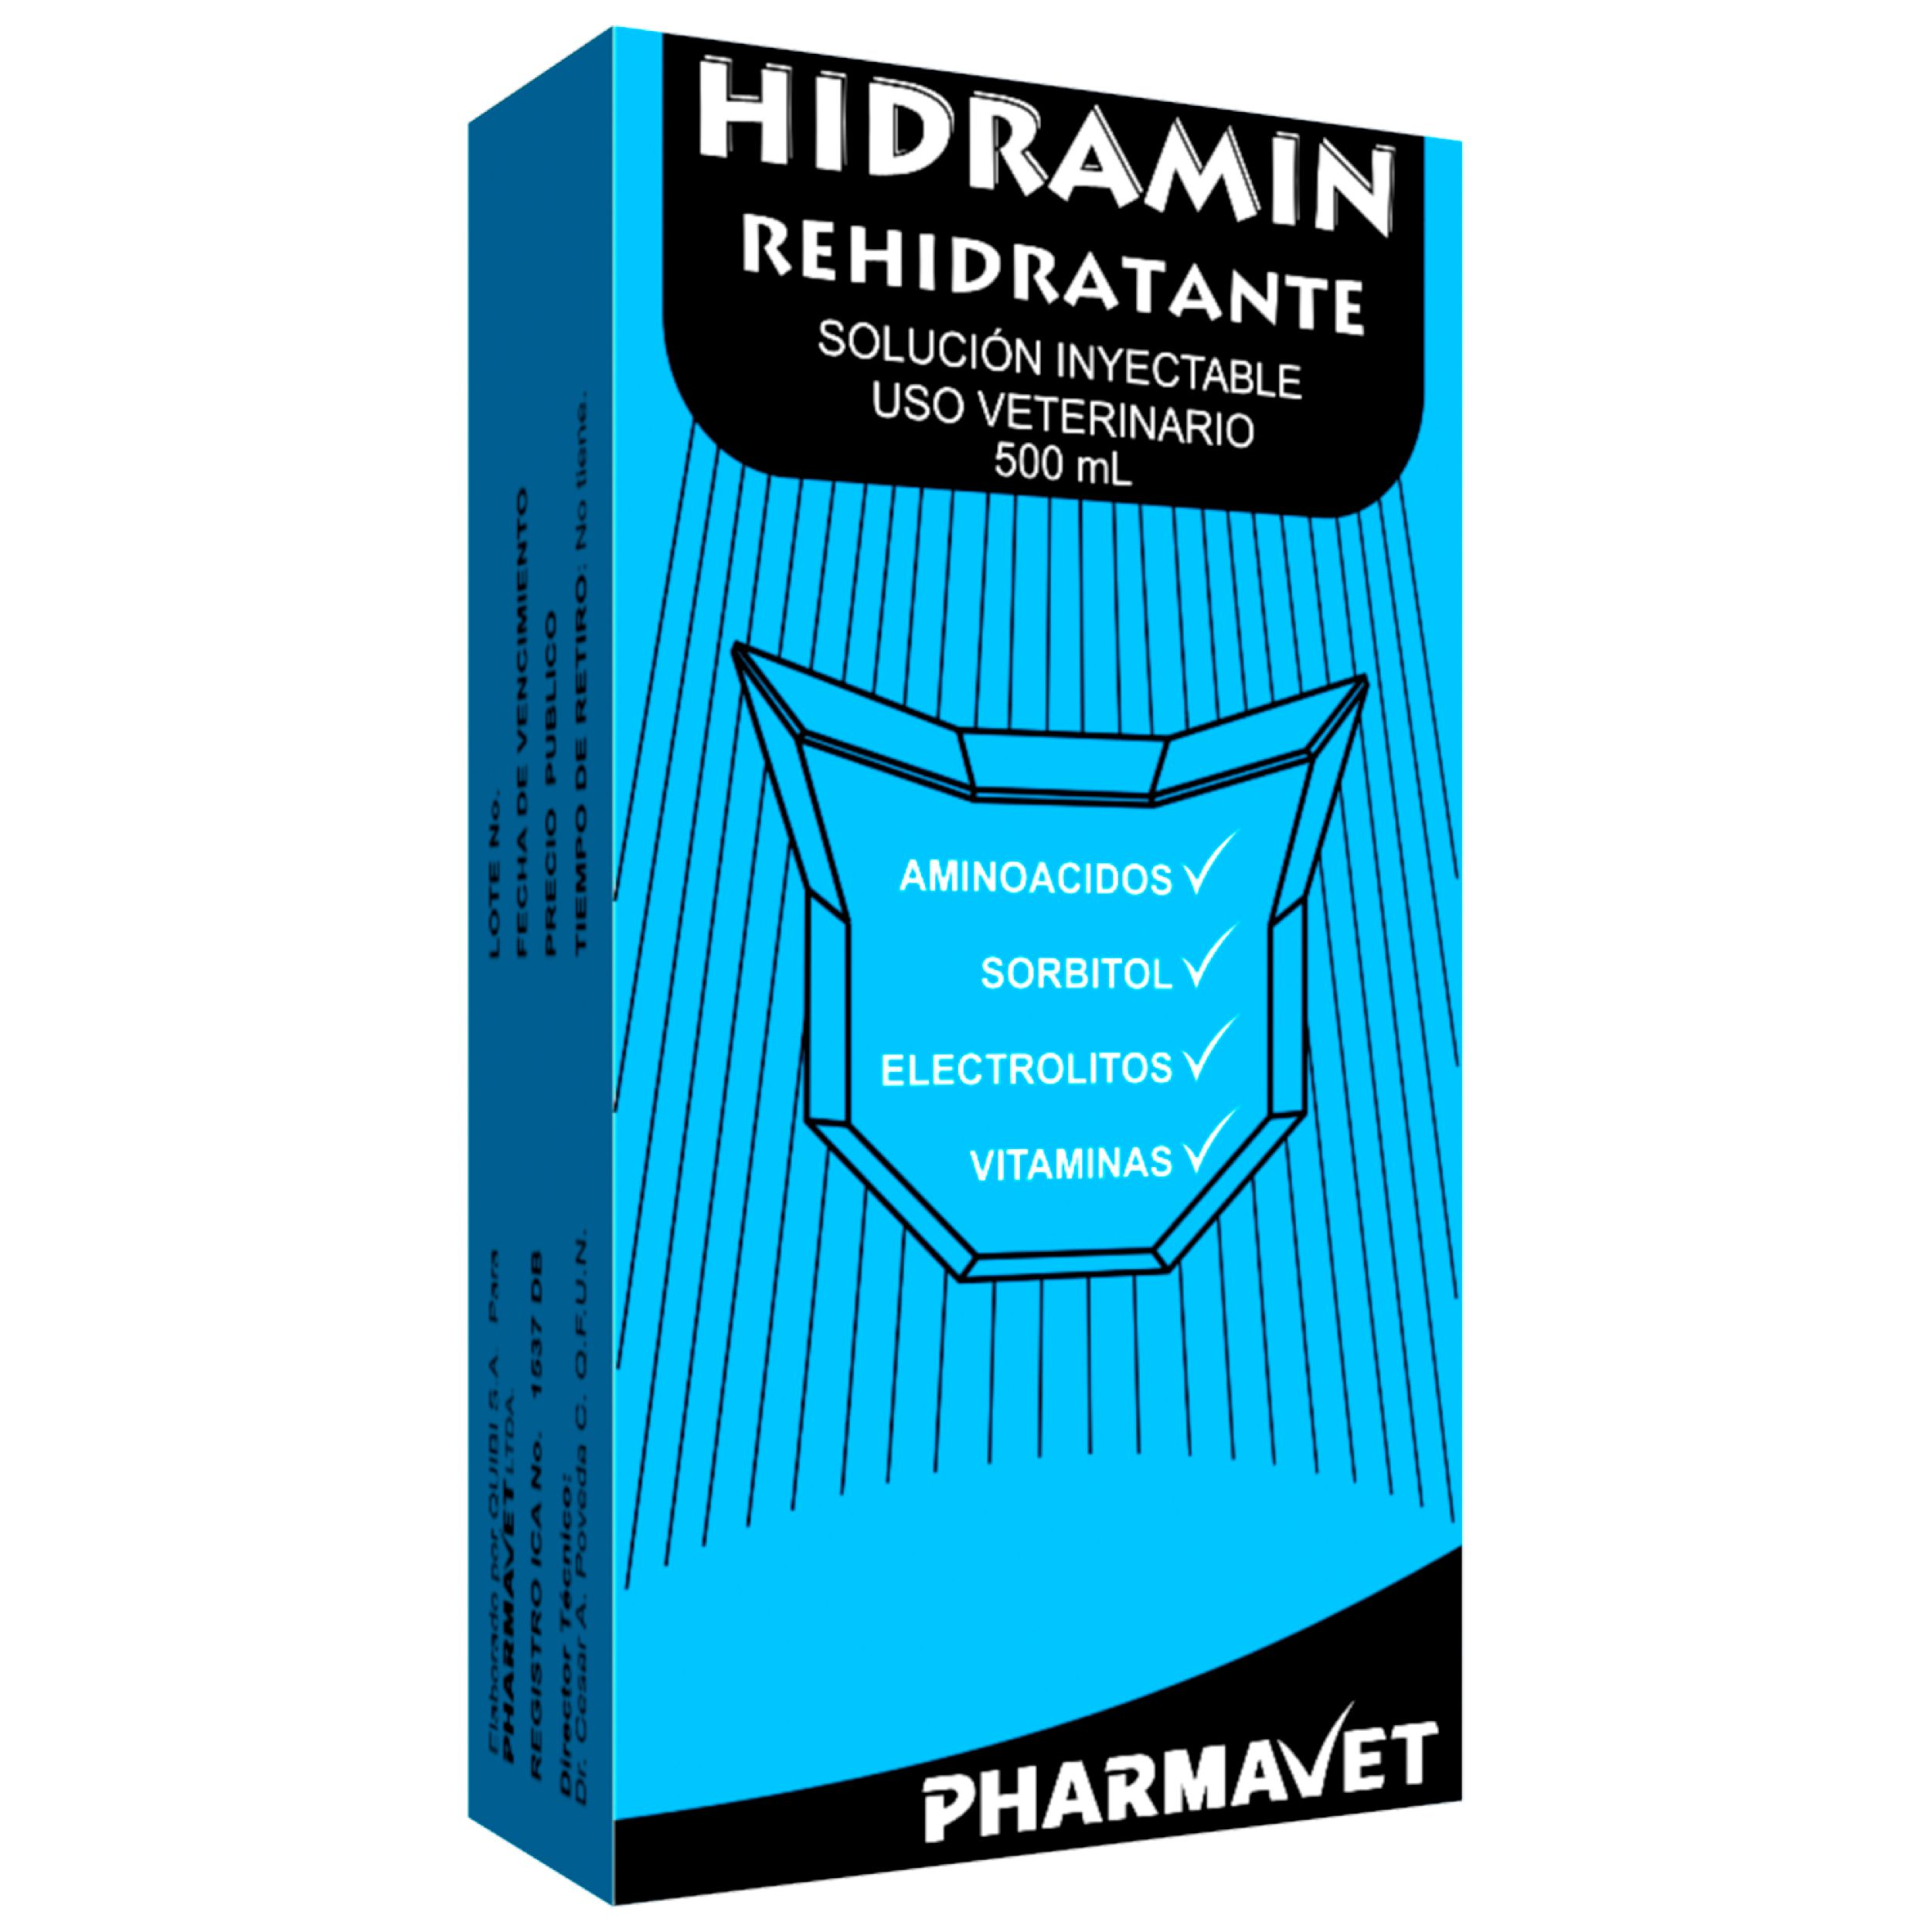 Hidramin Rehidratante